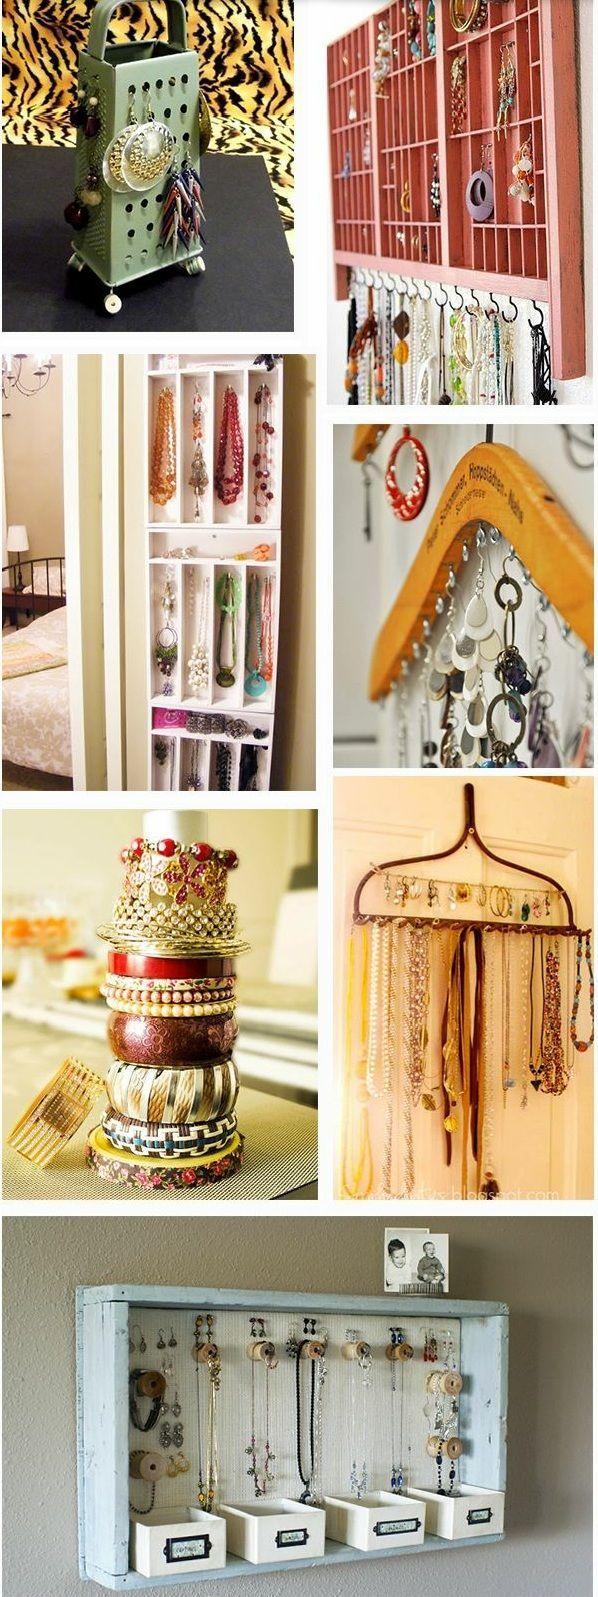 aufbewahrung f r schmuck diy ideen schmuckst nder selber bauen home pinterest. Black Bedroom Furniture Sets. Home Design Ideas